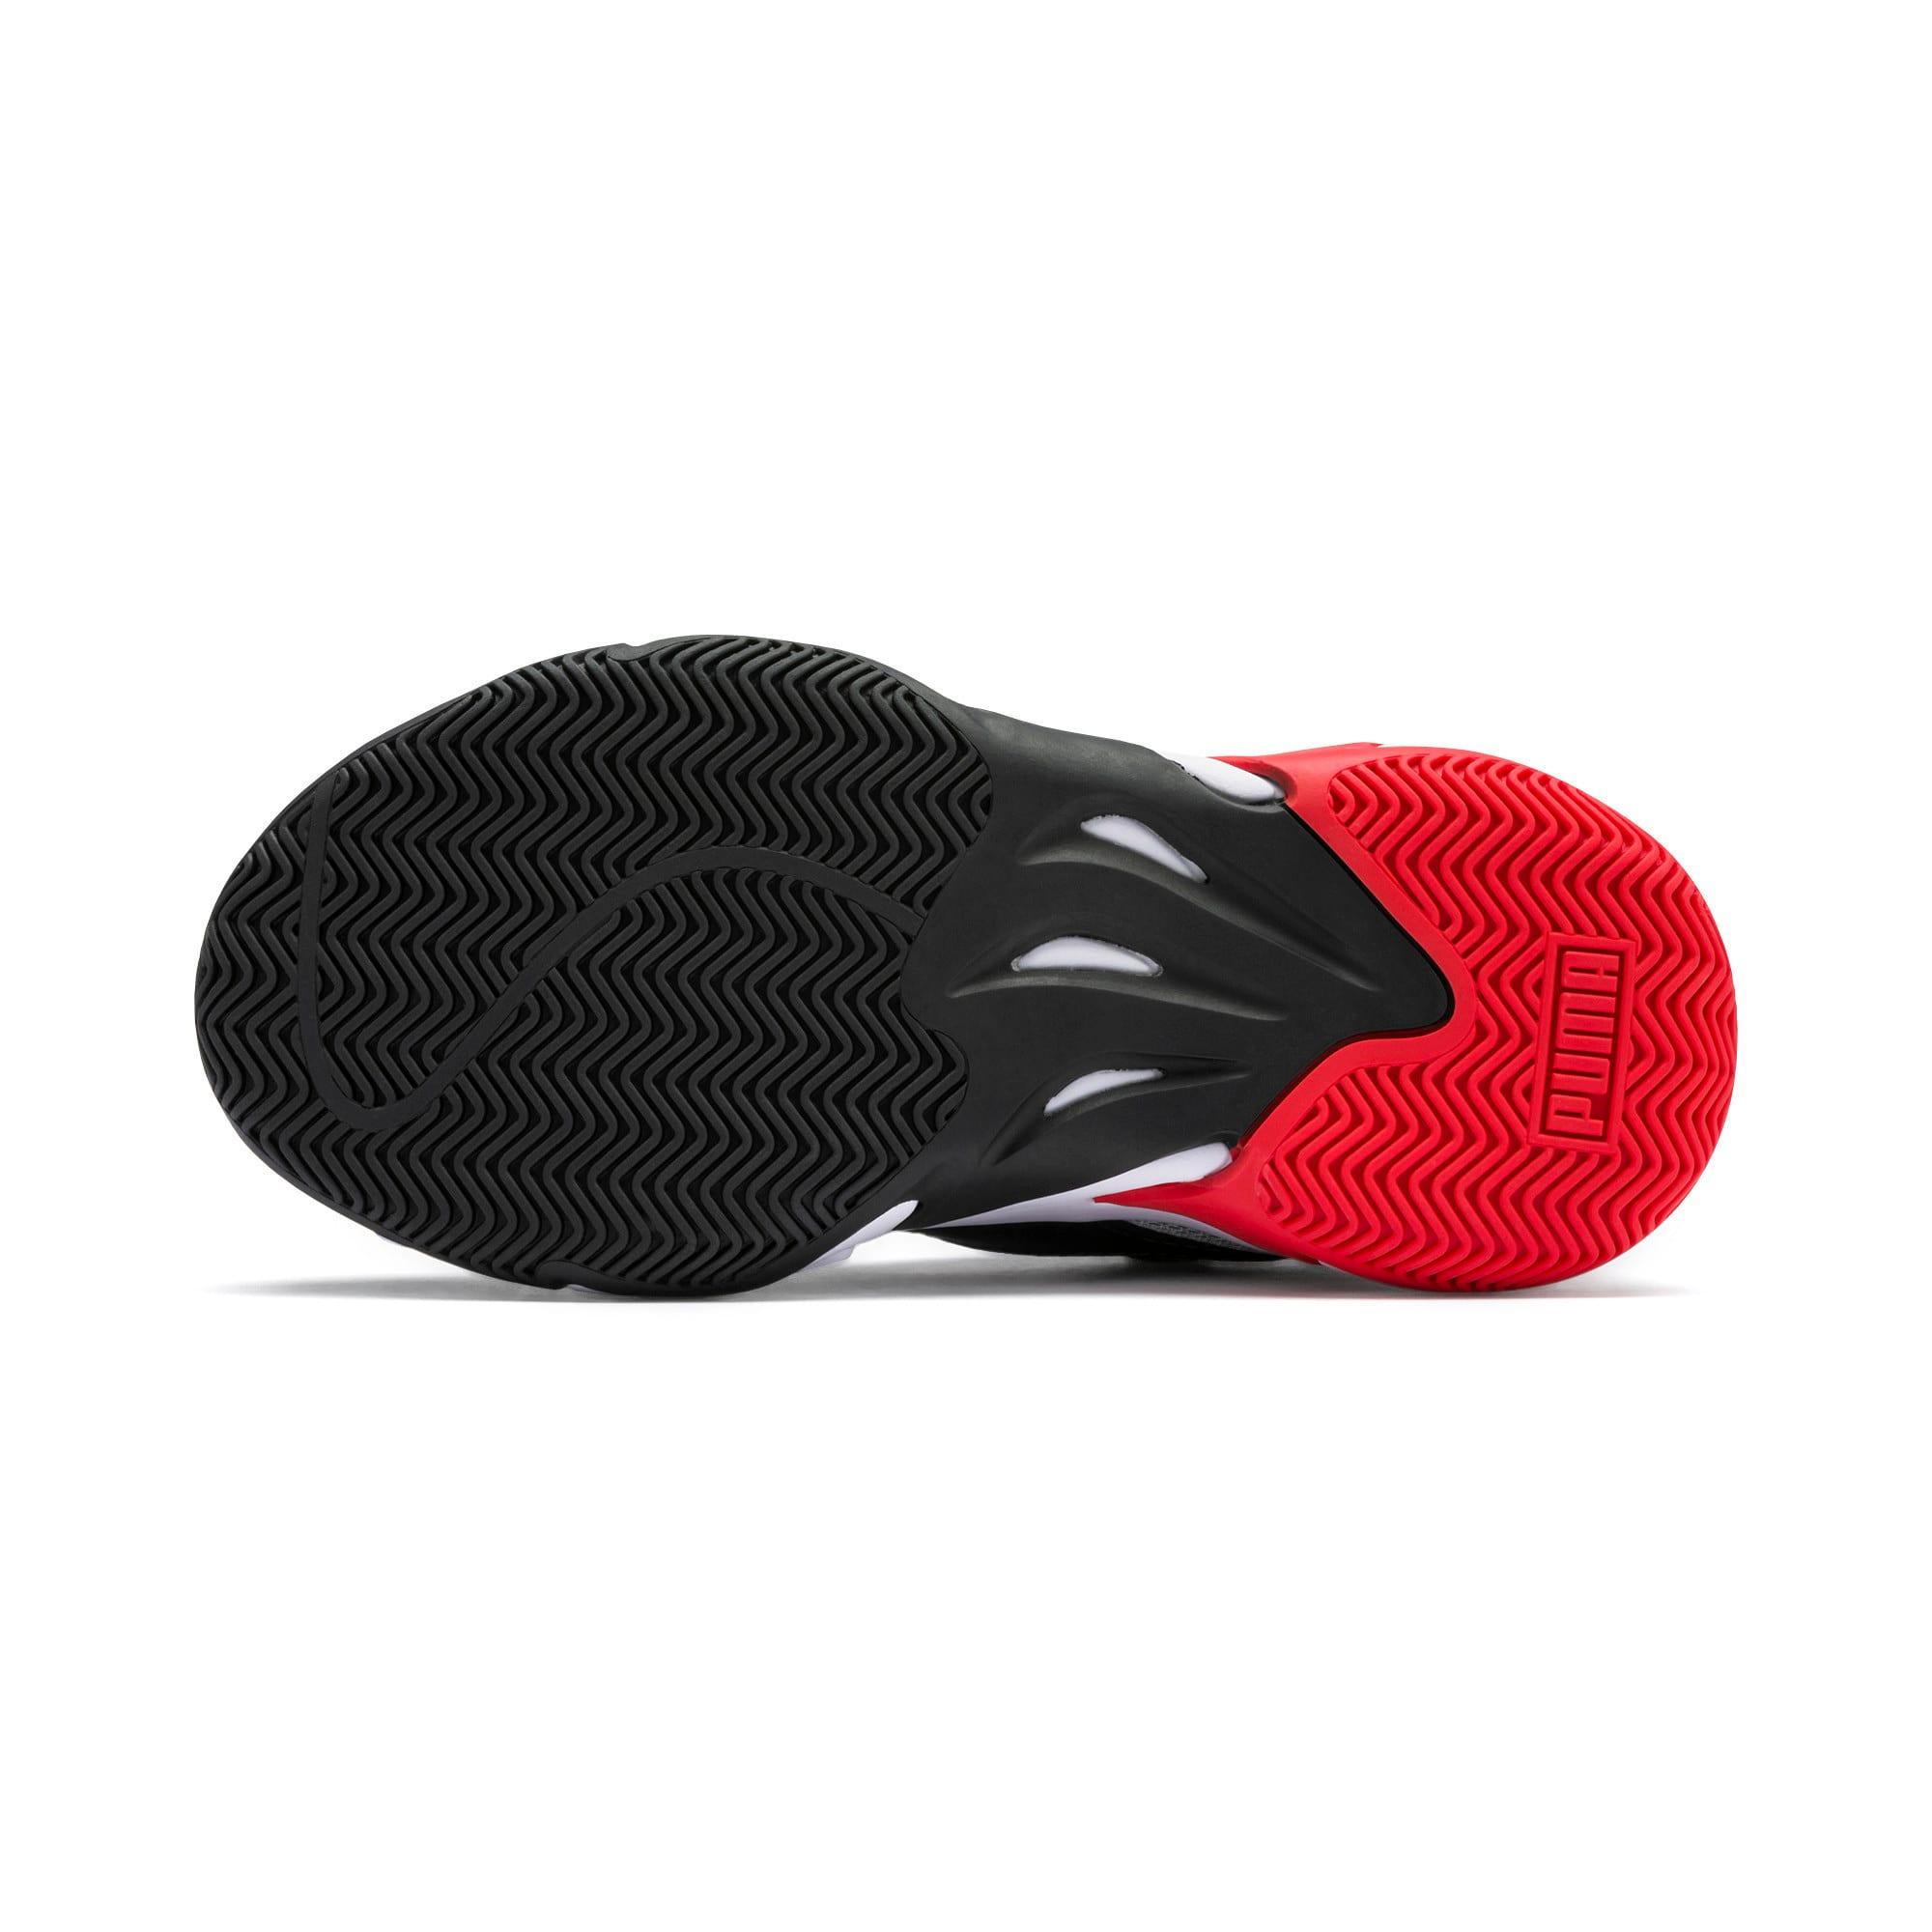 Imagen en miniatura 4 de Zapatillas de niño Storm Origin, Puma Black-High Rise, mediana